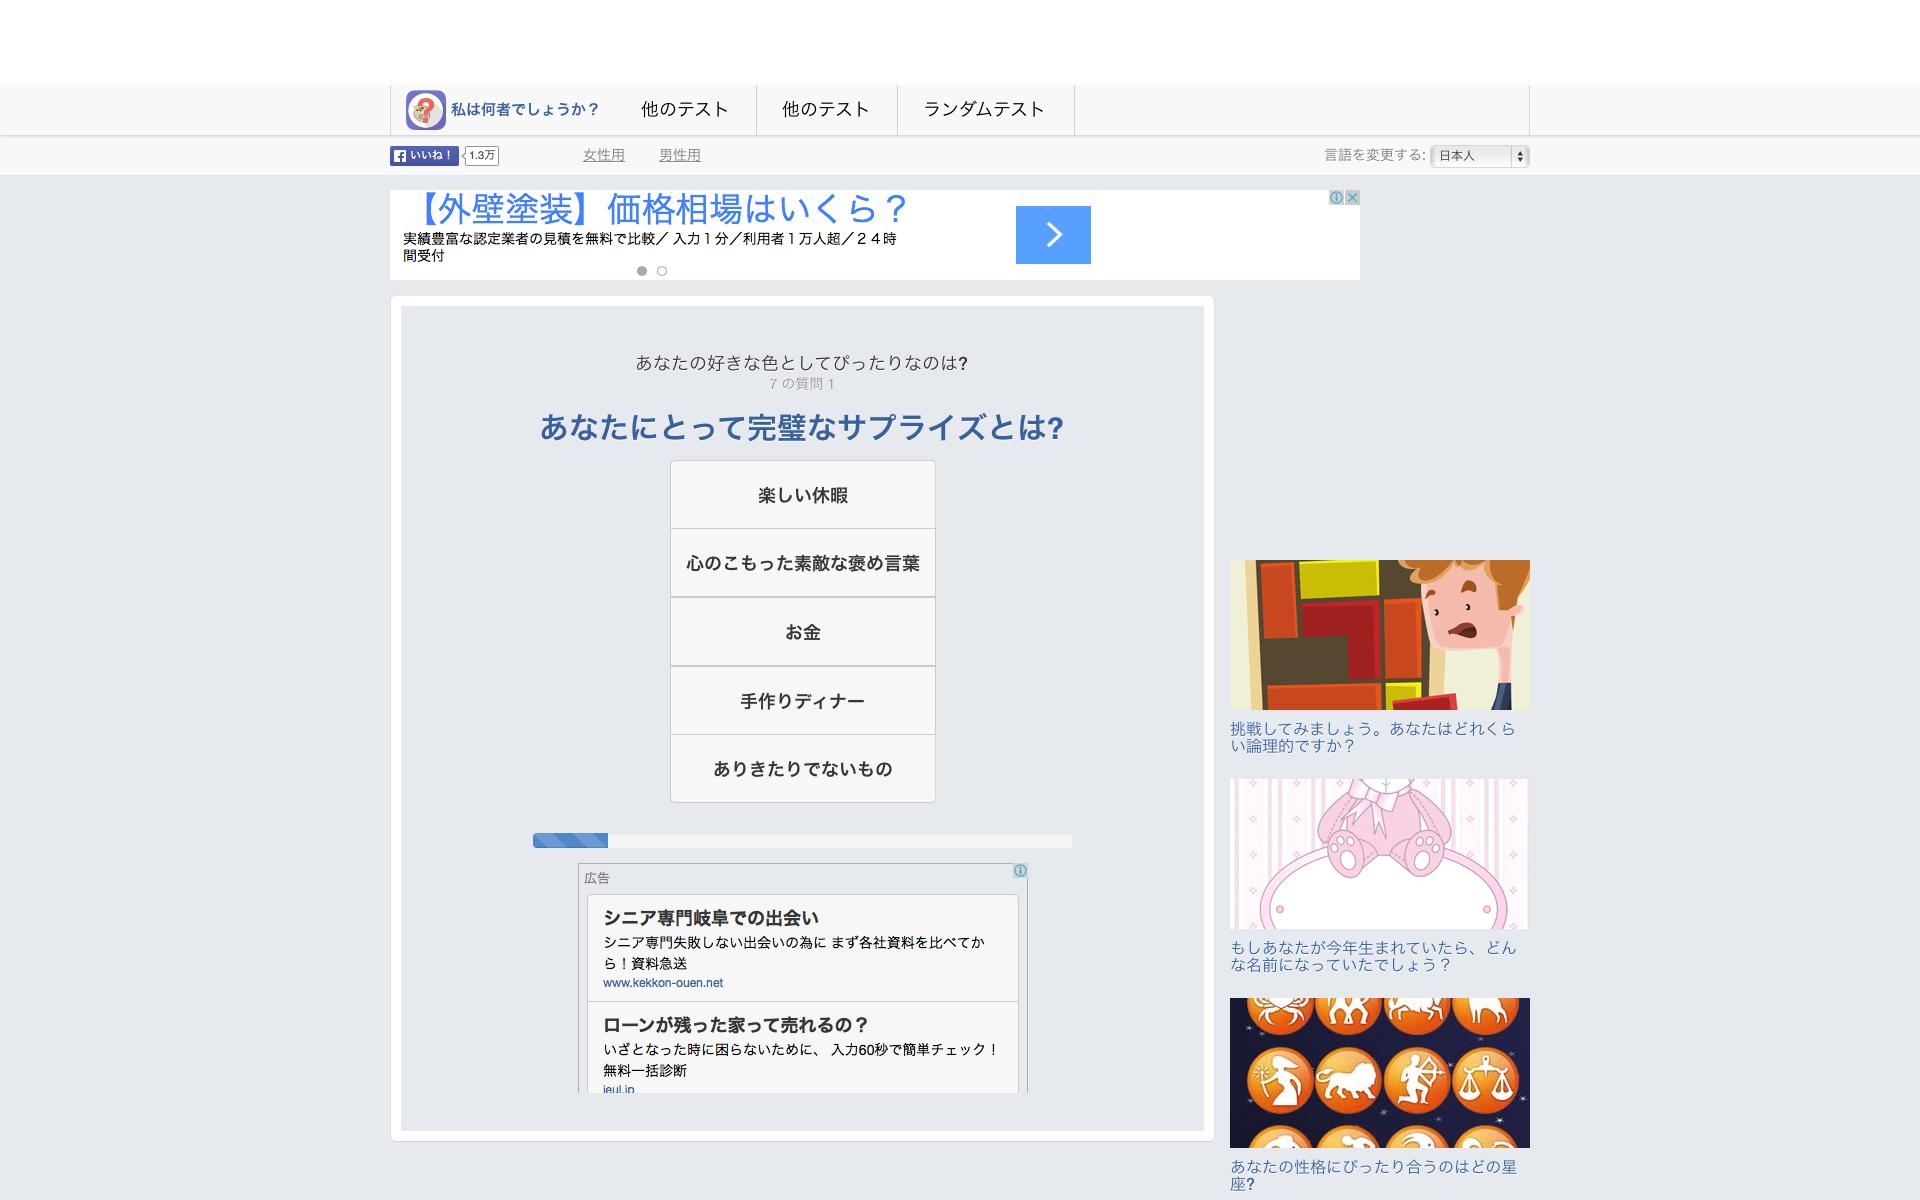 Shindan-20150628-2